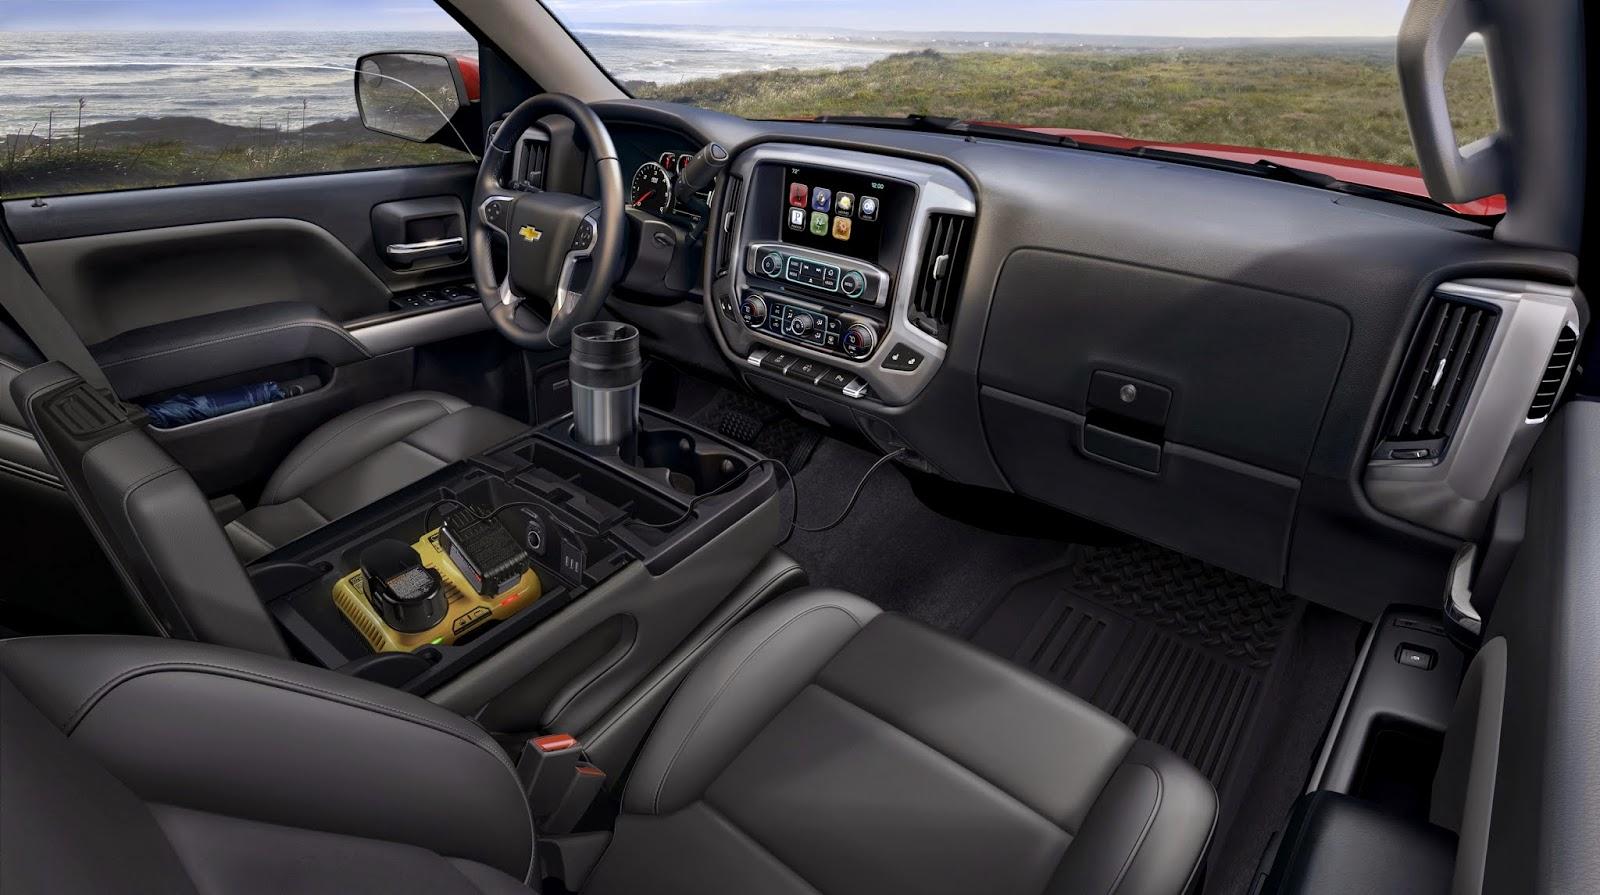 uautoknow.net: Chevrolet announces new Silverado Rally Edition pick-up